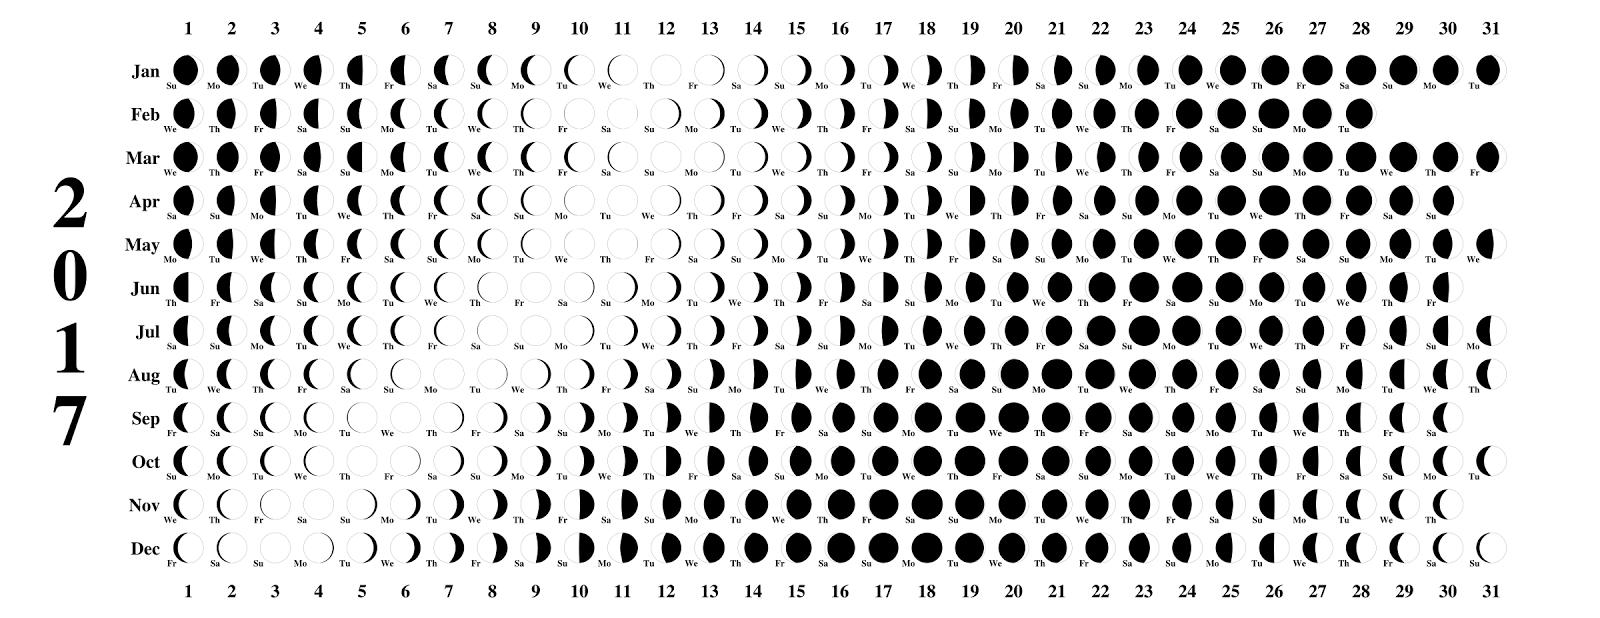 Moon Phase Calendar 2017 Templates  Xjb